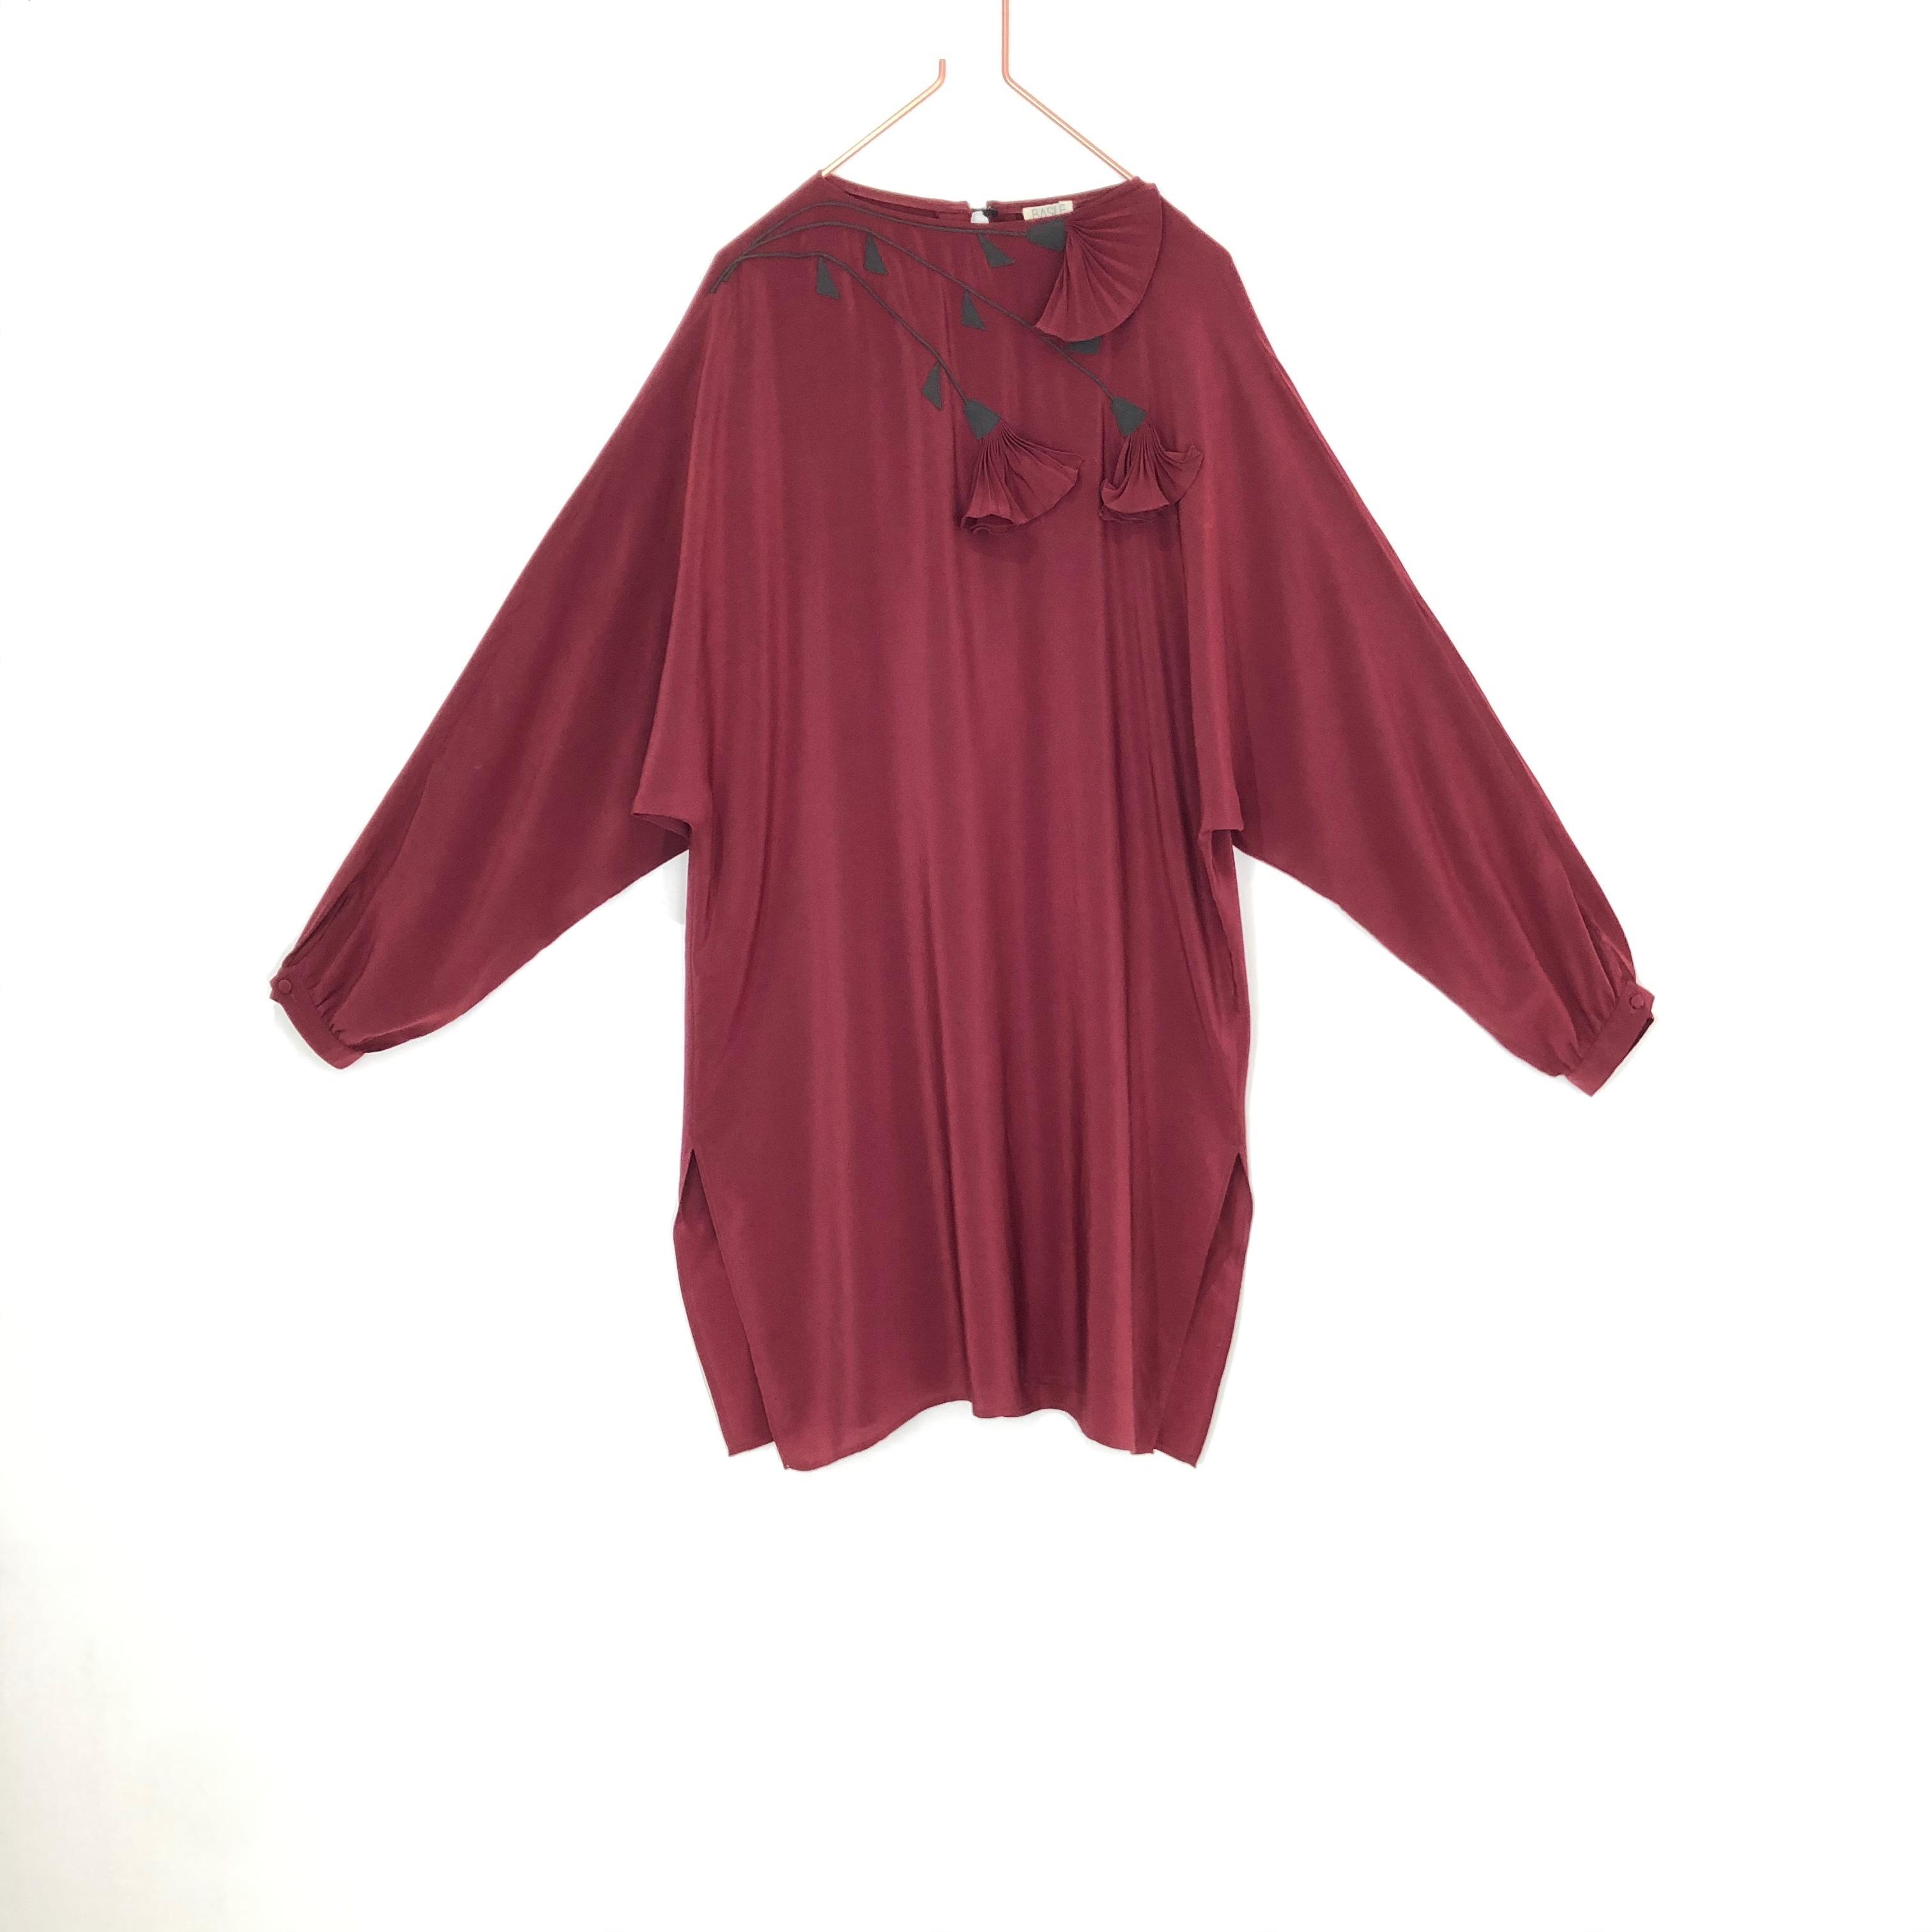 ◼︎80s vintage flower motif silk dress from Italy◼︎